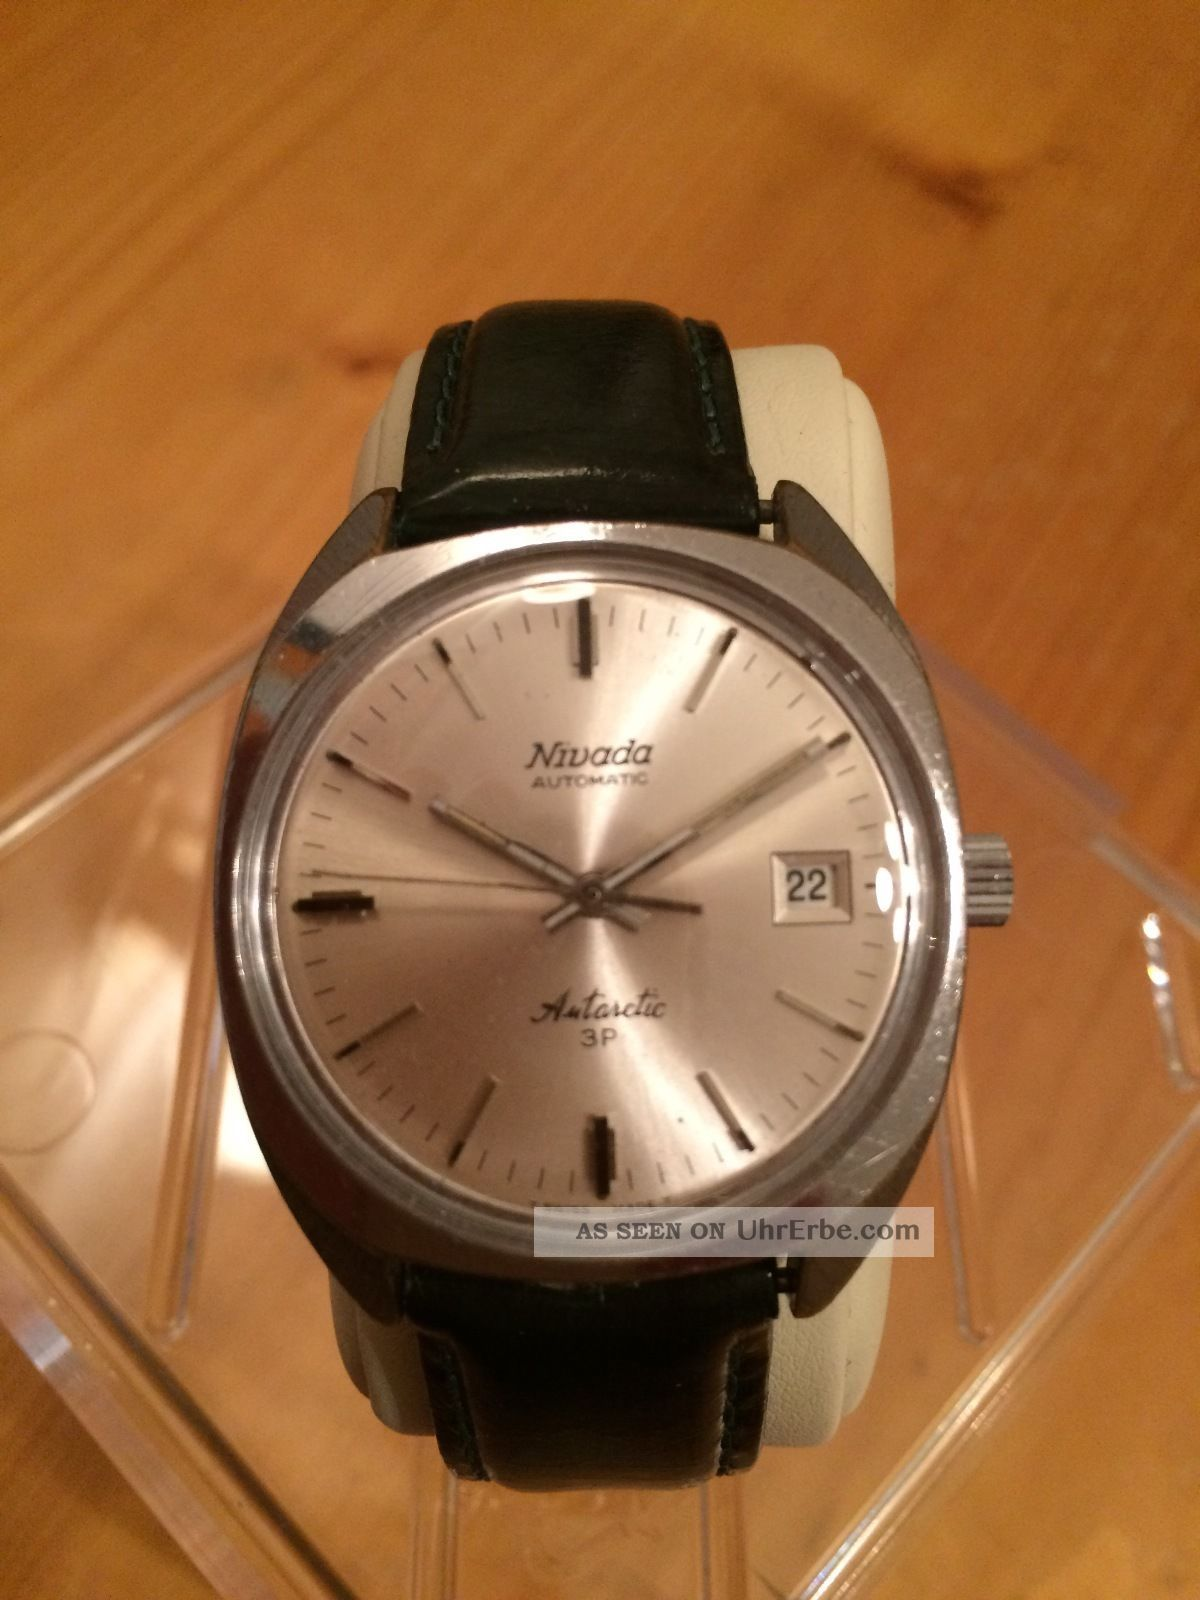 Exclusive,  Sehr Schöne Nivada Automatik (schweiz) Armbanduhren Bild